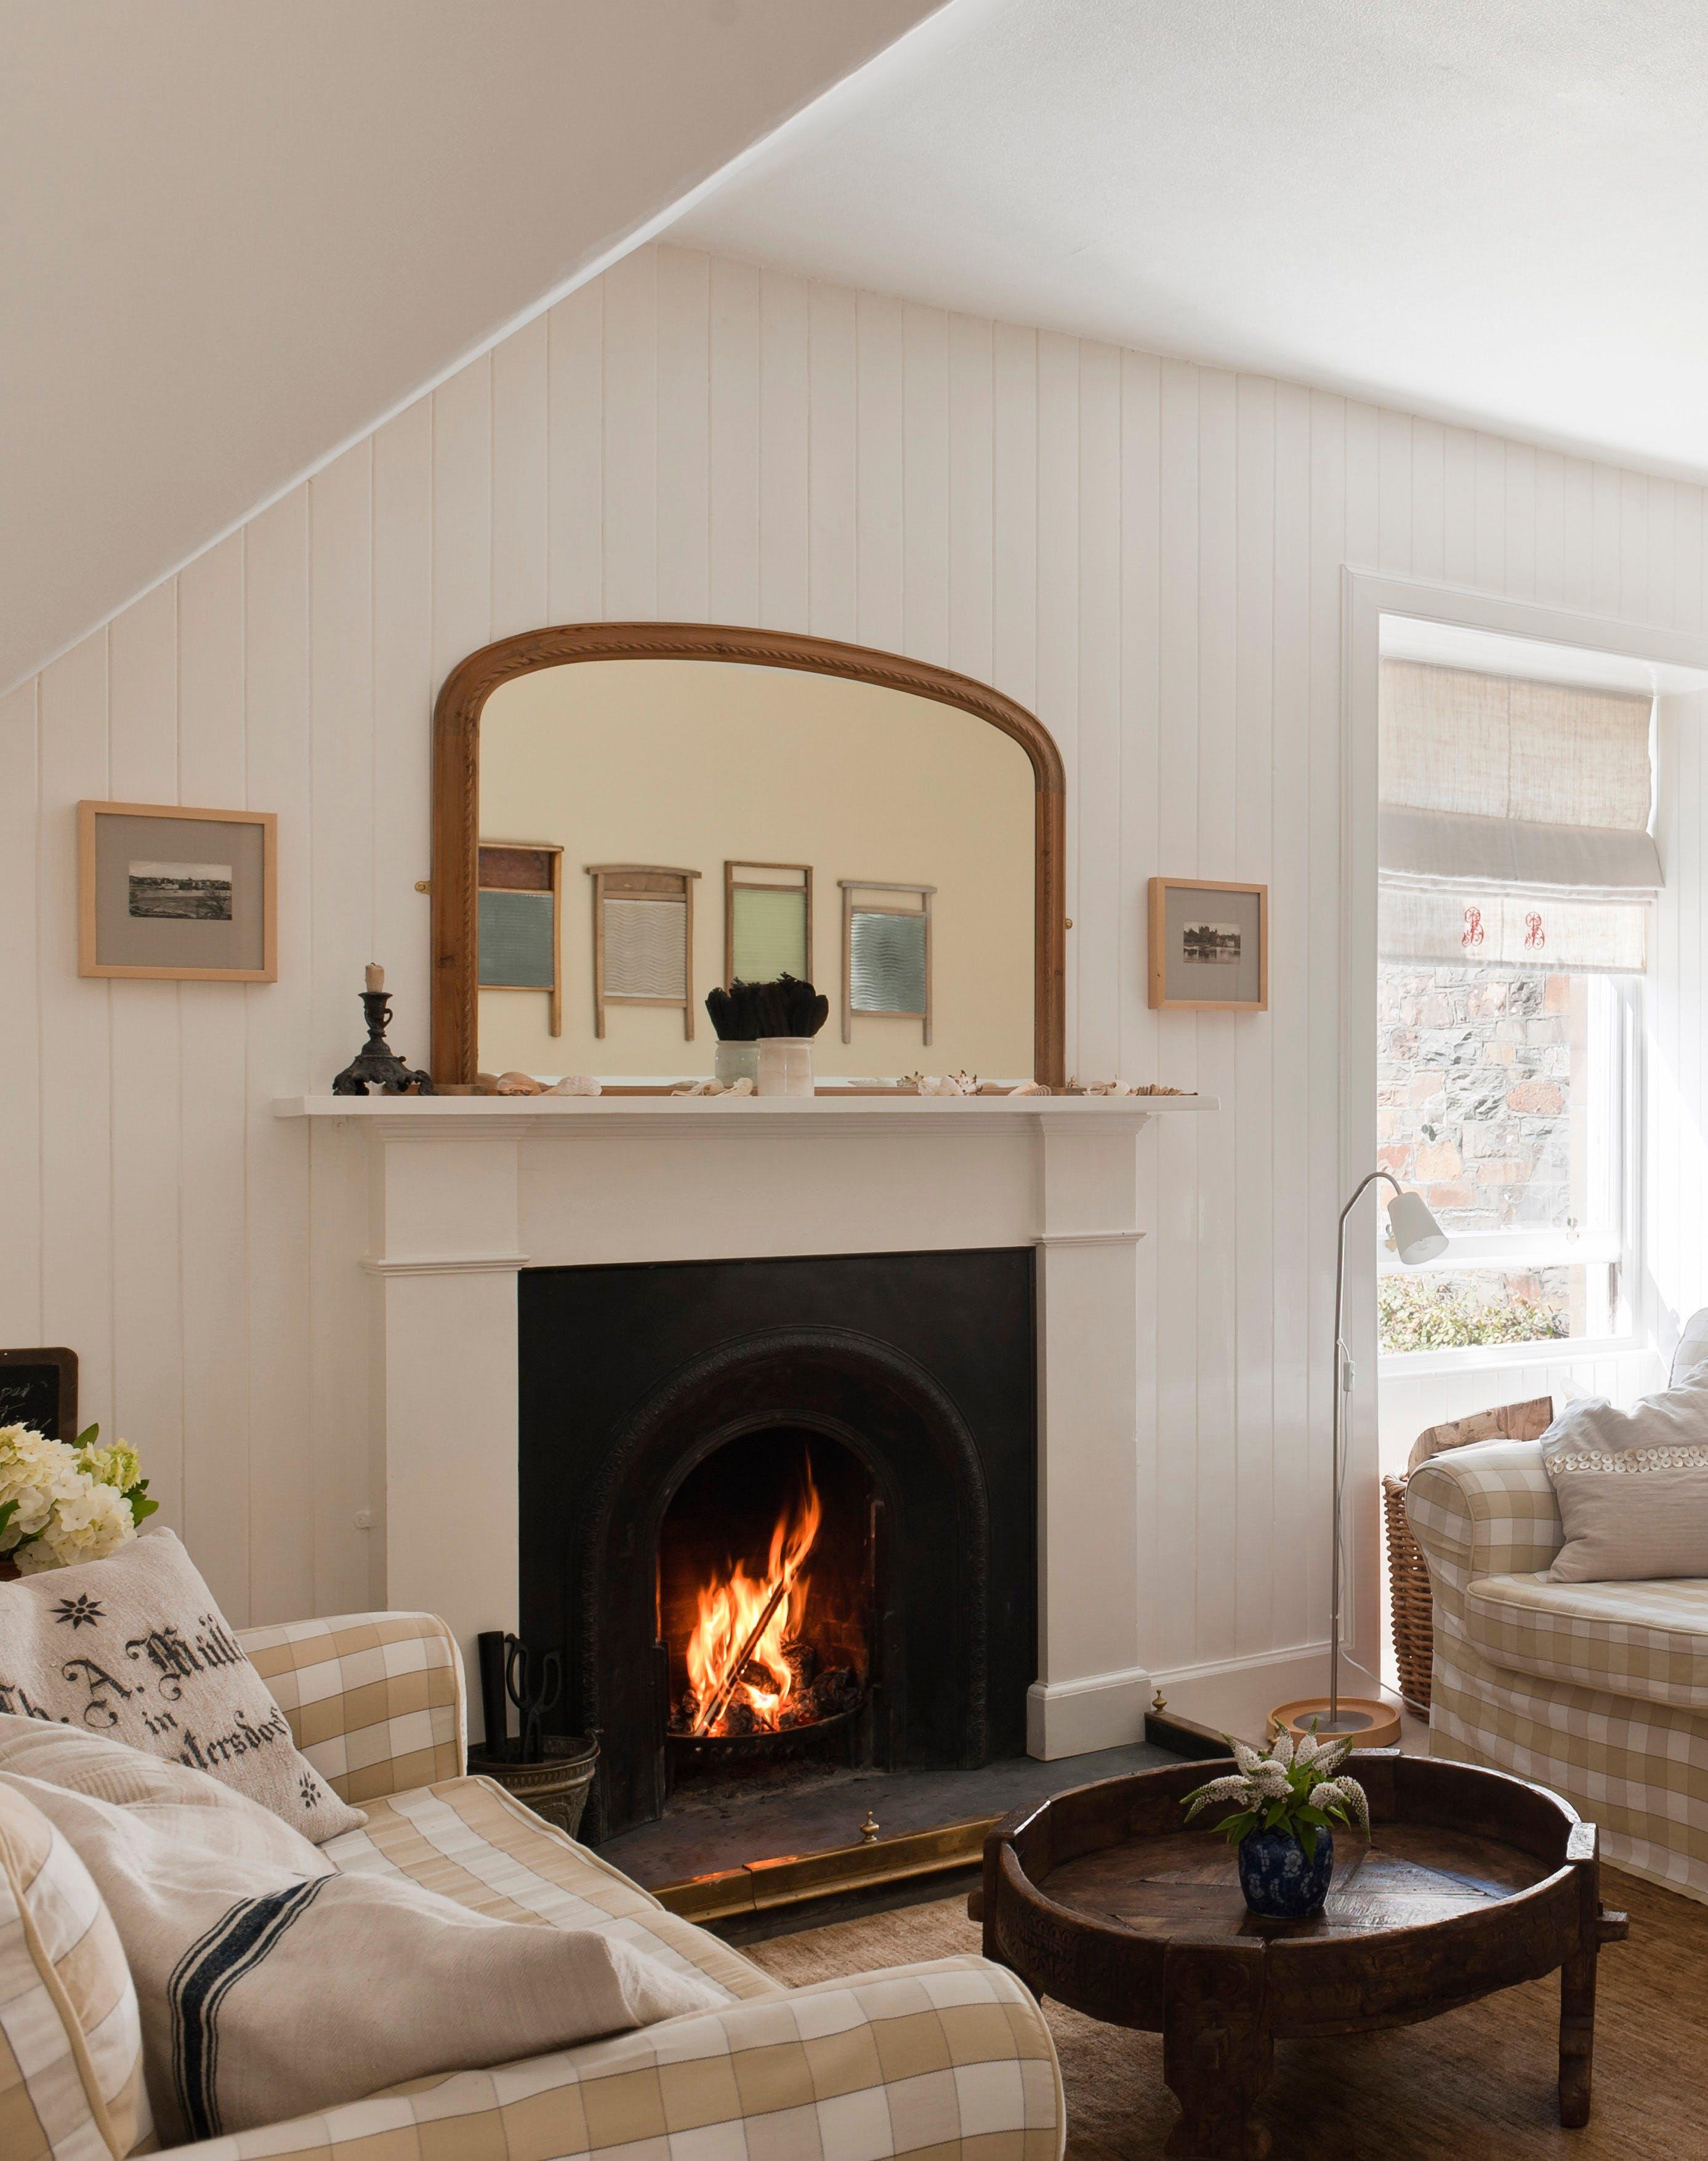 20 Cozy Fireplace Mantel Ideas and Design Inspiration – PureWow